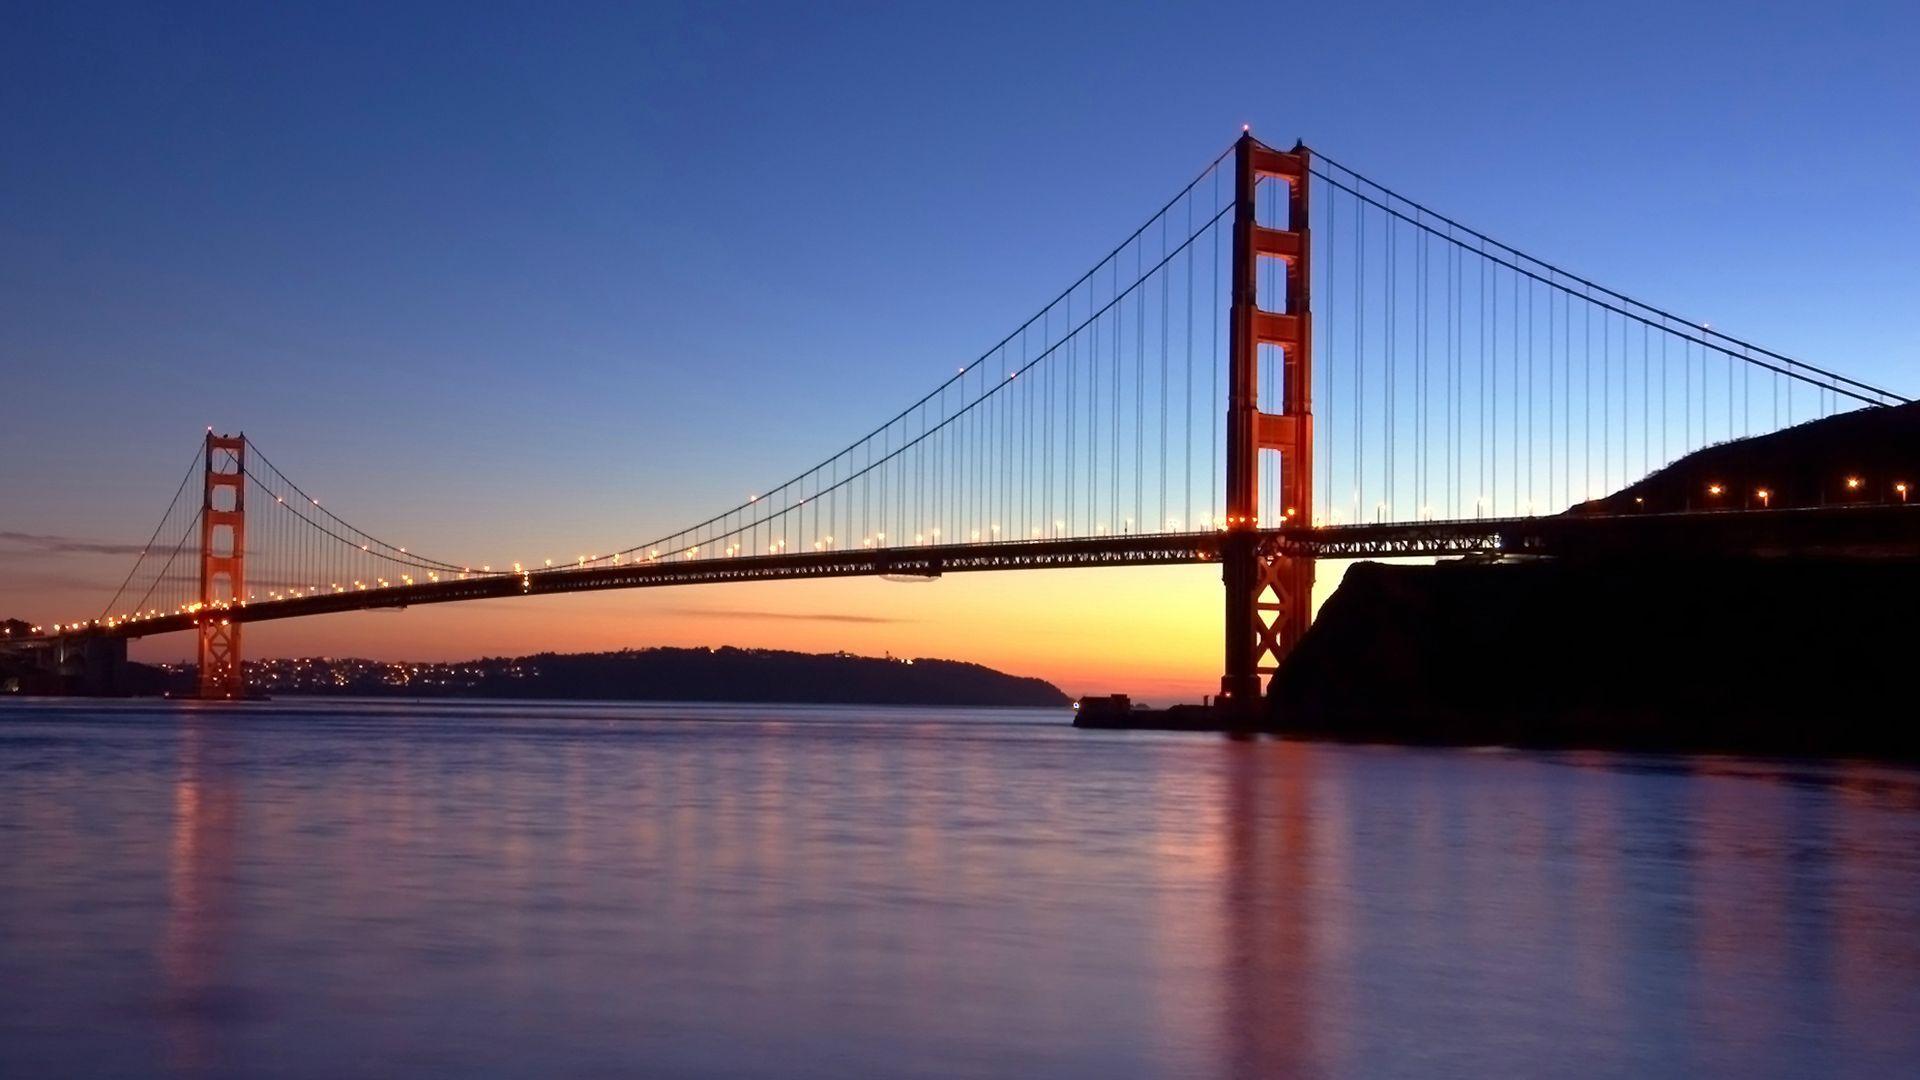 50 Mobile Laptop And Desktop Wallpaper Hd High Resolution Golden Gate Bridge San Francisco Golden Gate Bridge Golden Gate Bridge Wallpaper